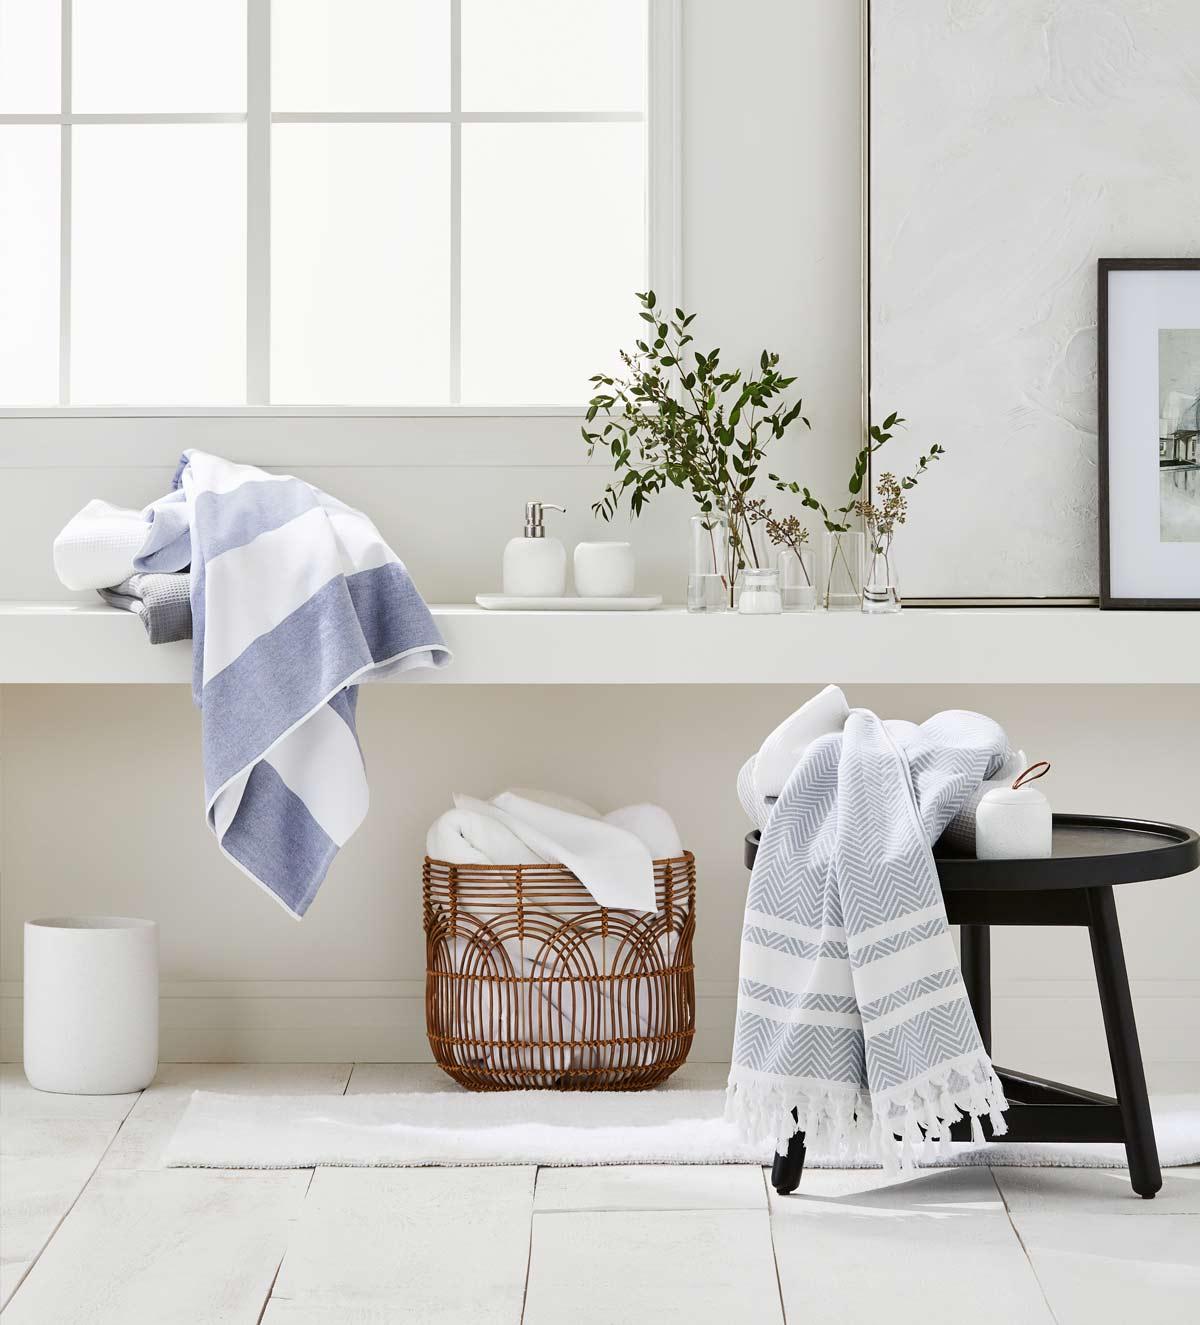 GlucksteinHome | Cozy Towels & Stylish Accessories